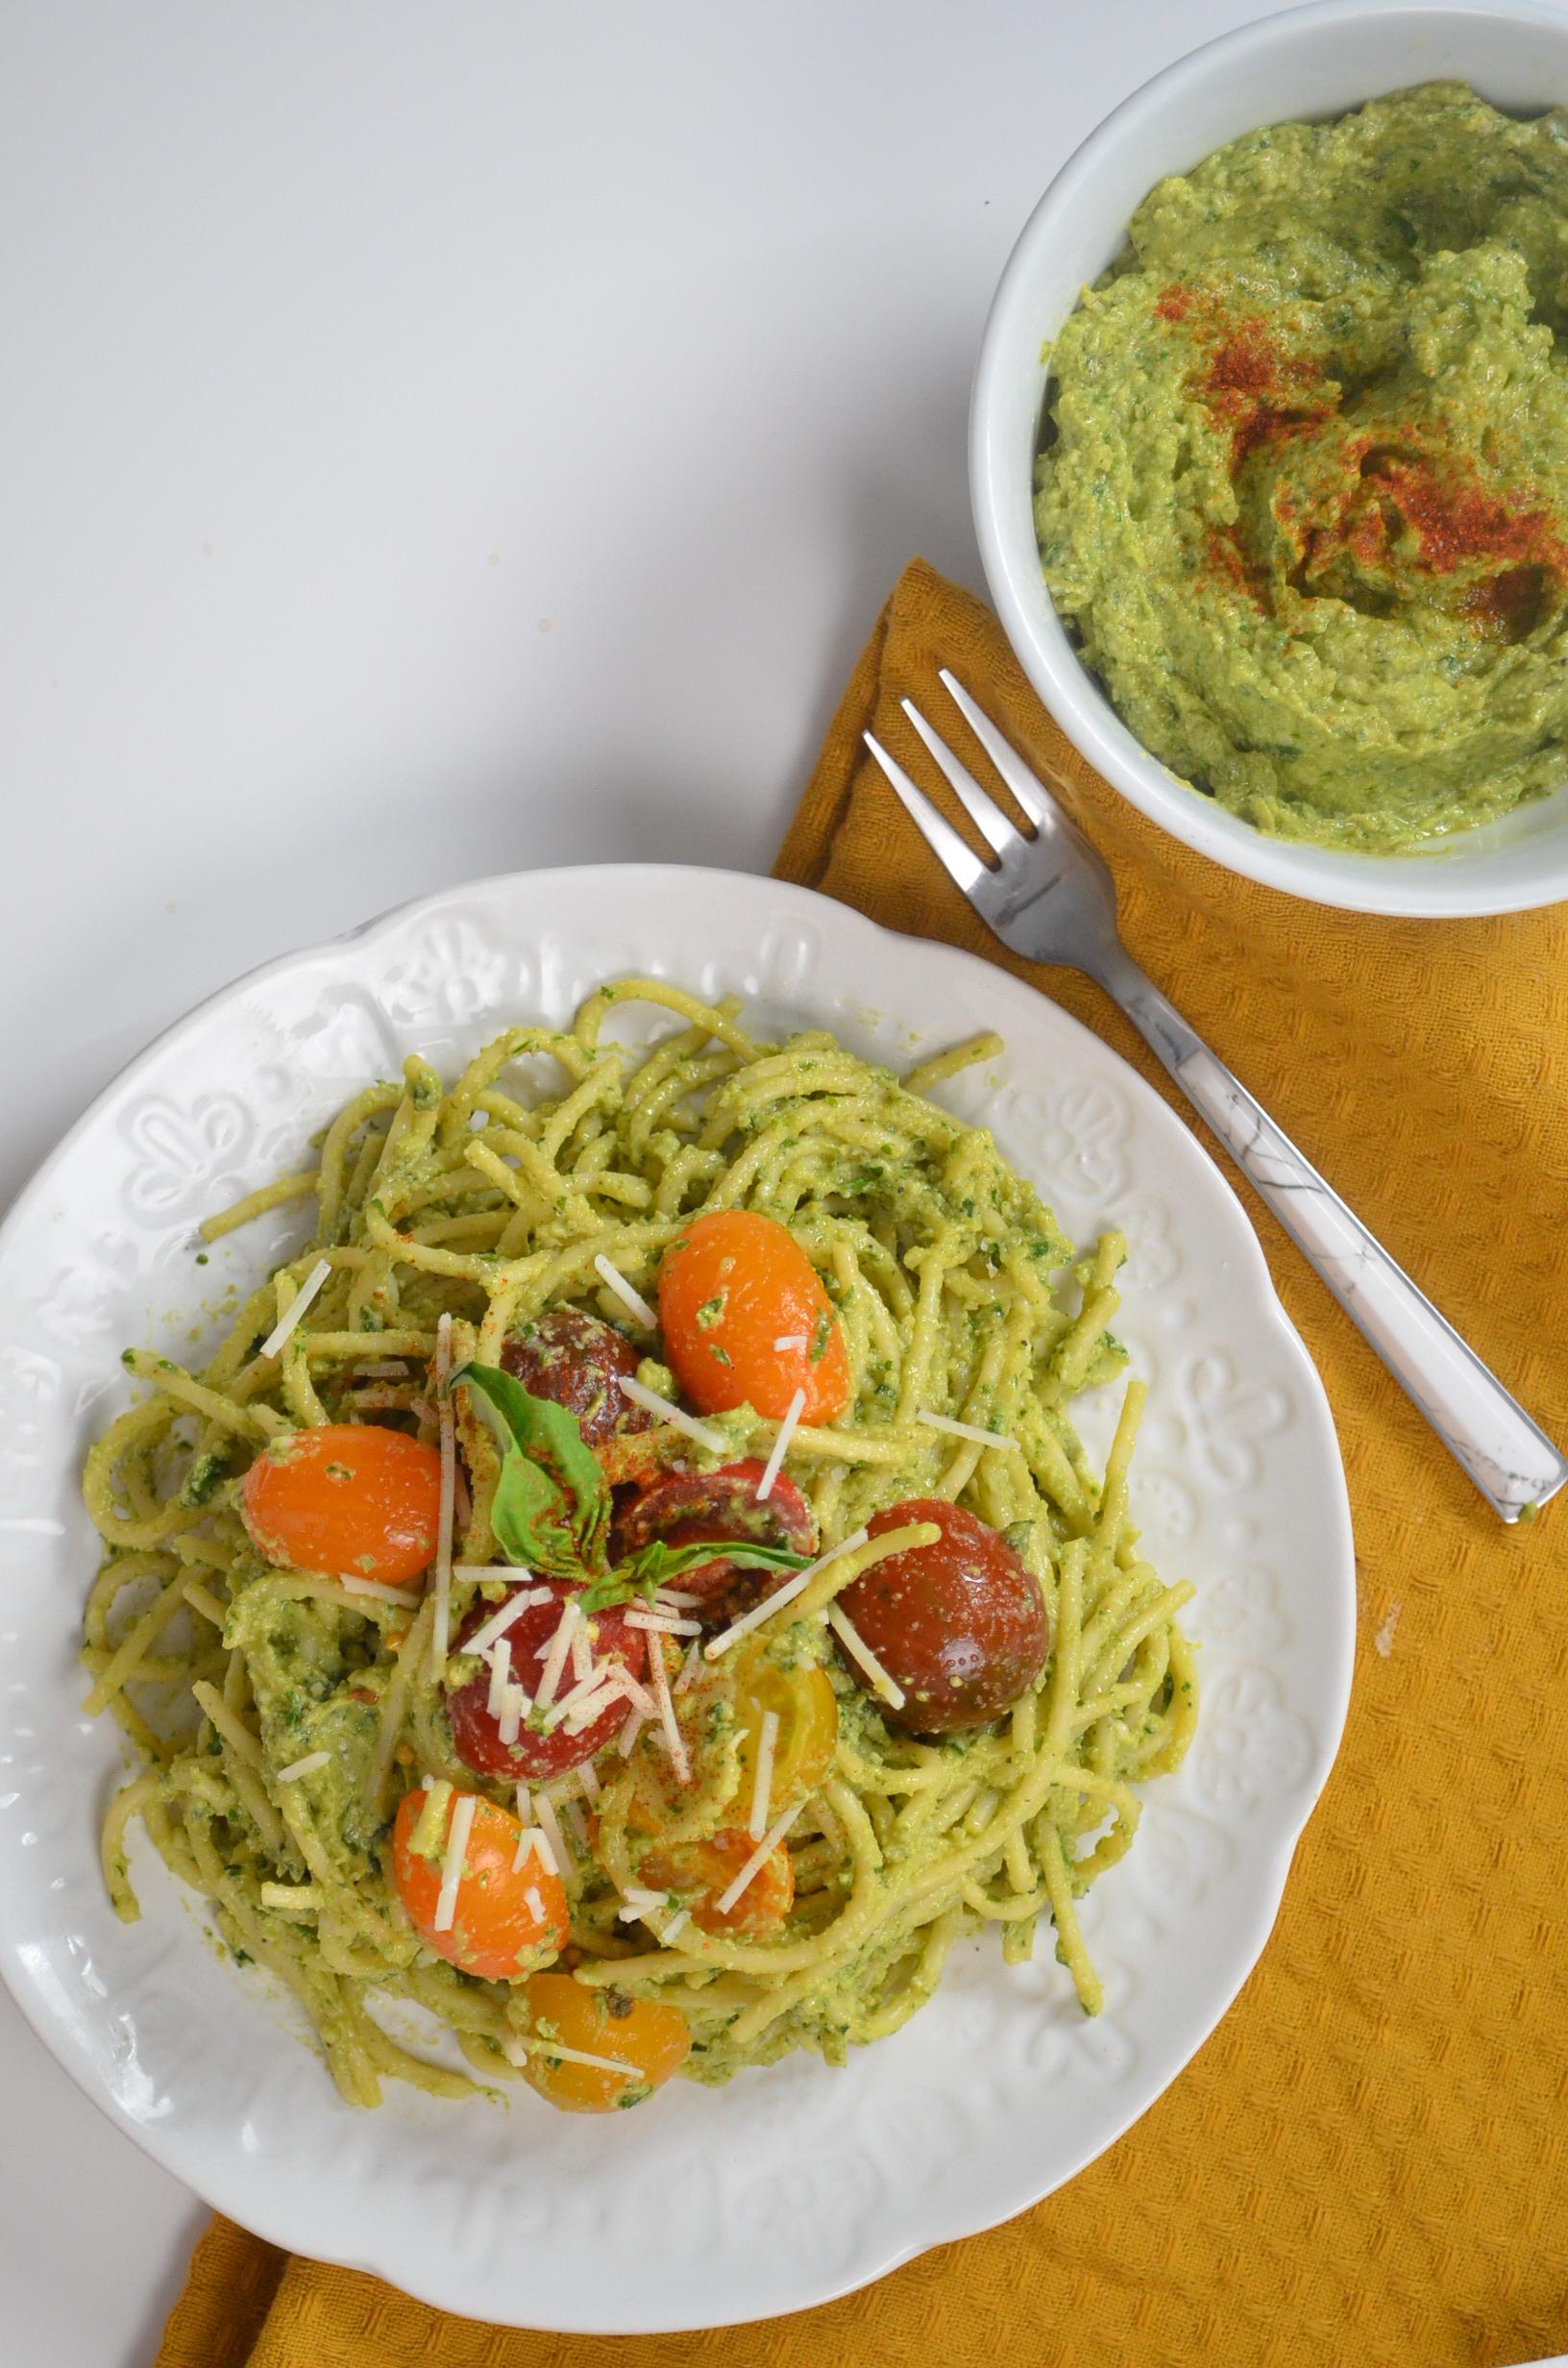 Avocado Basil Pesto Spaghetti